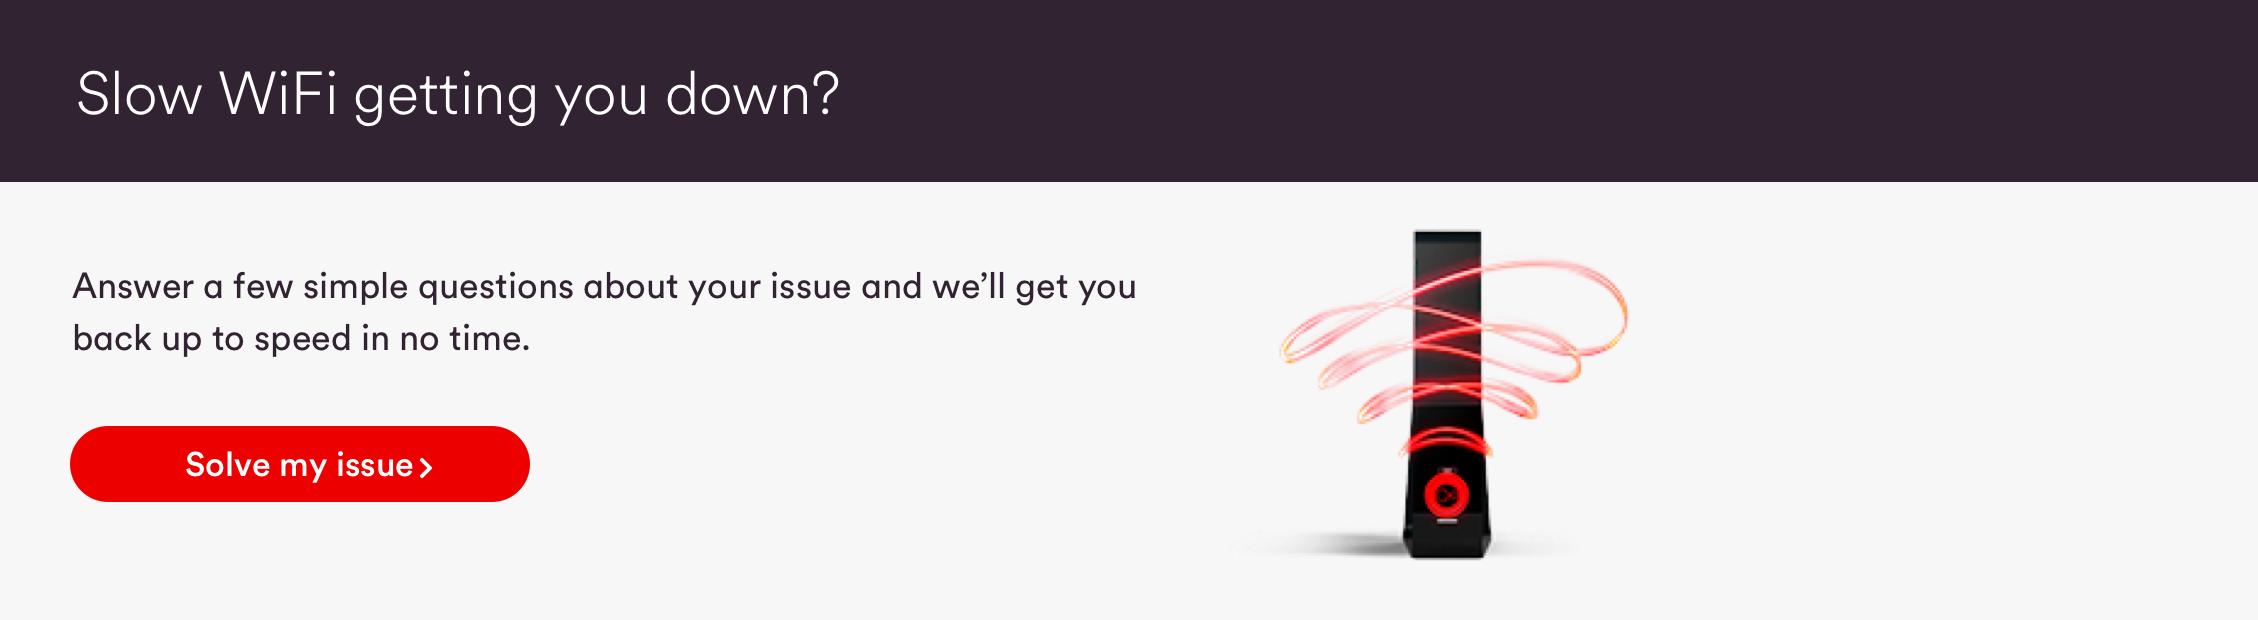 How do I improve my WiFi connection speed? | Virgin Media